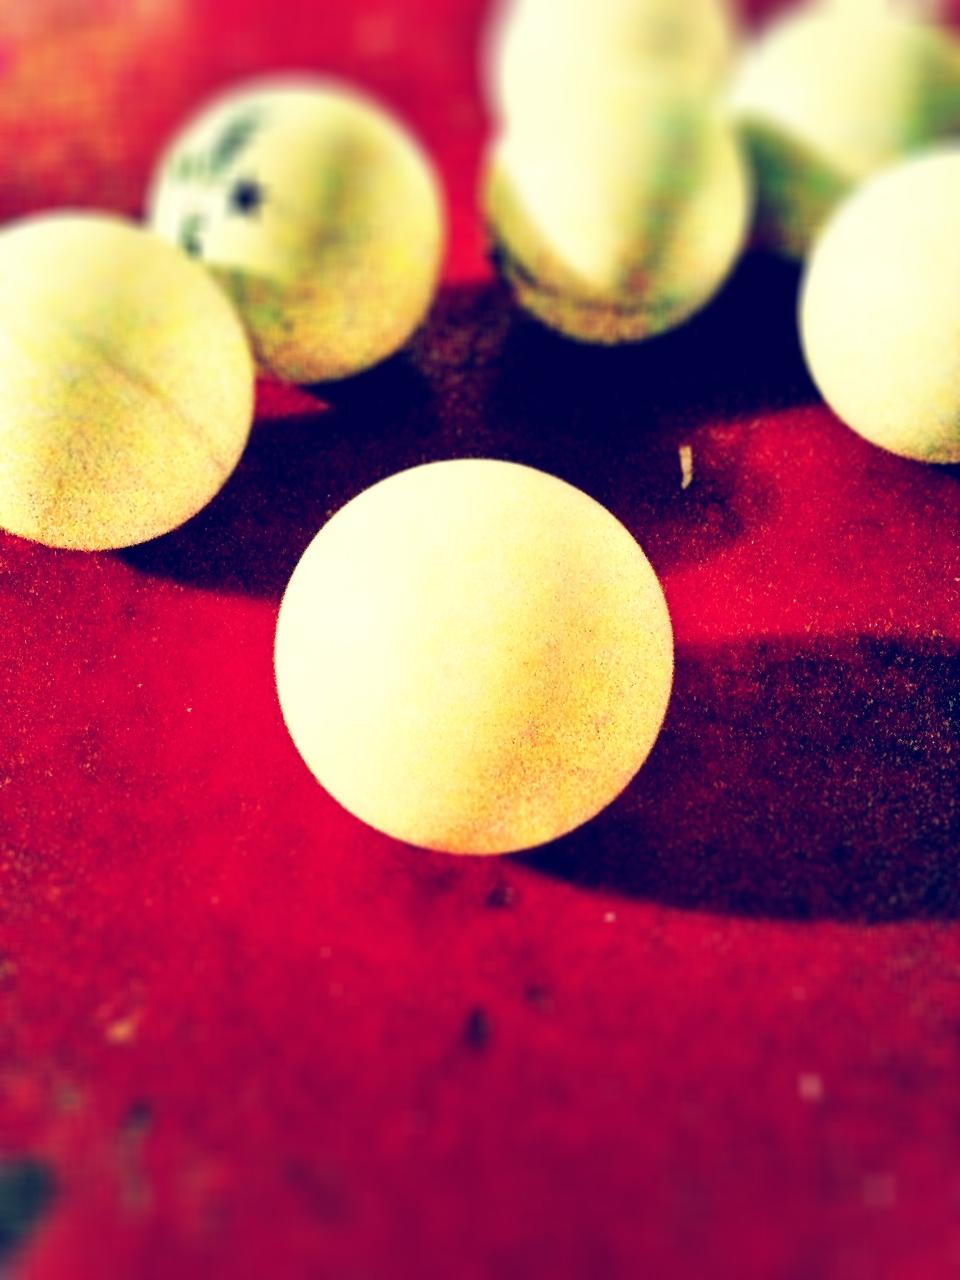 I found some balls.